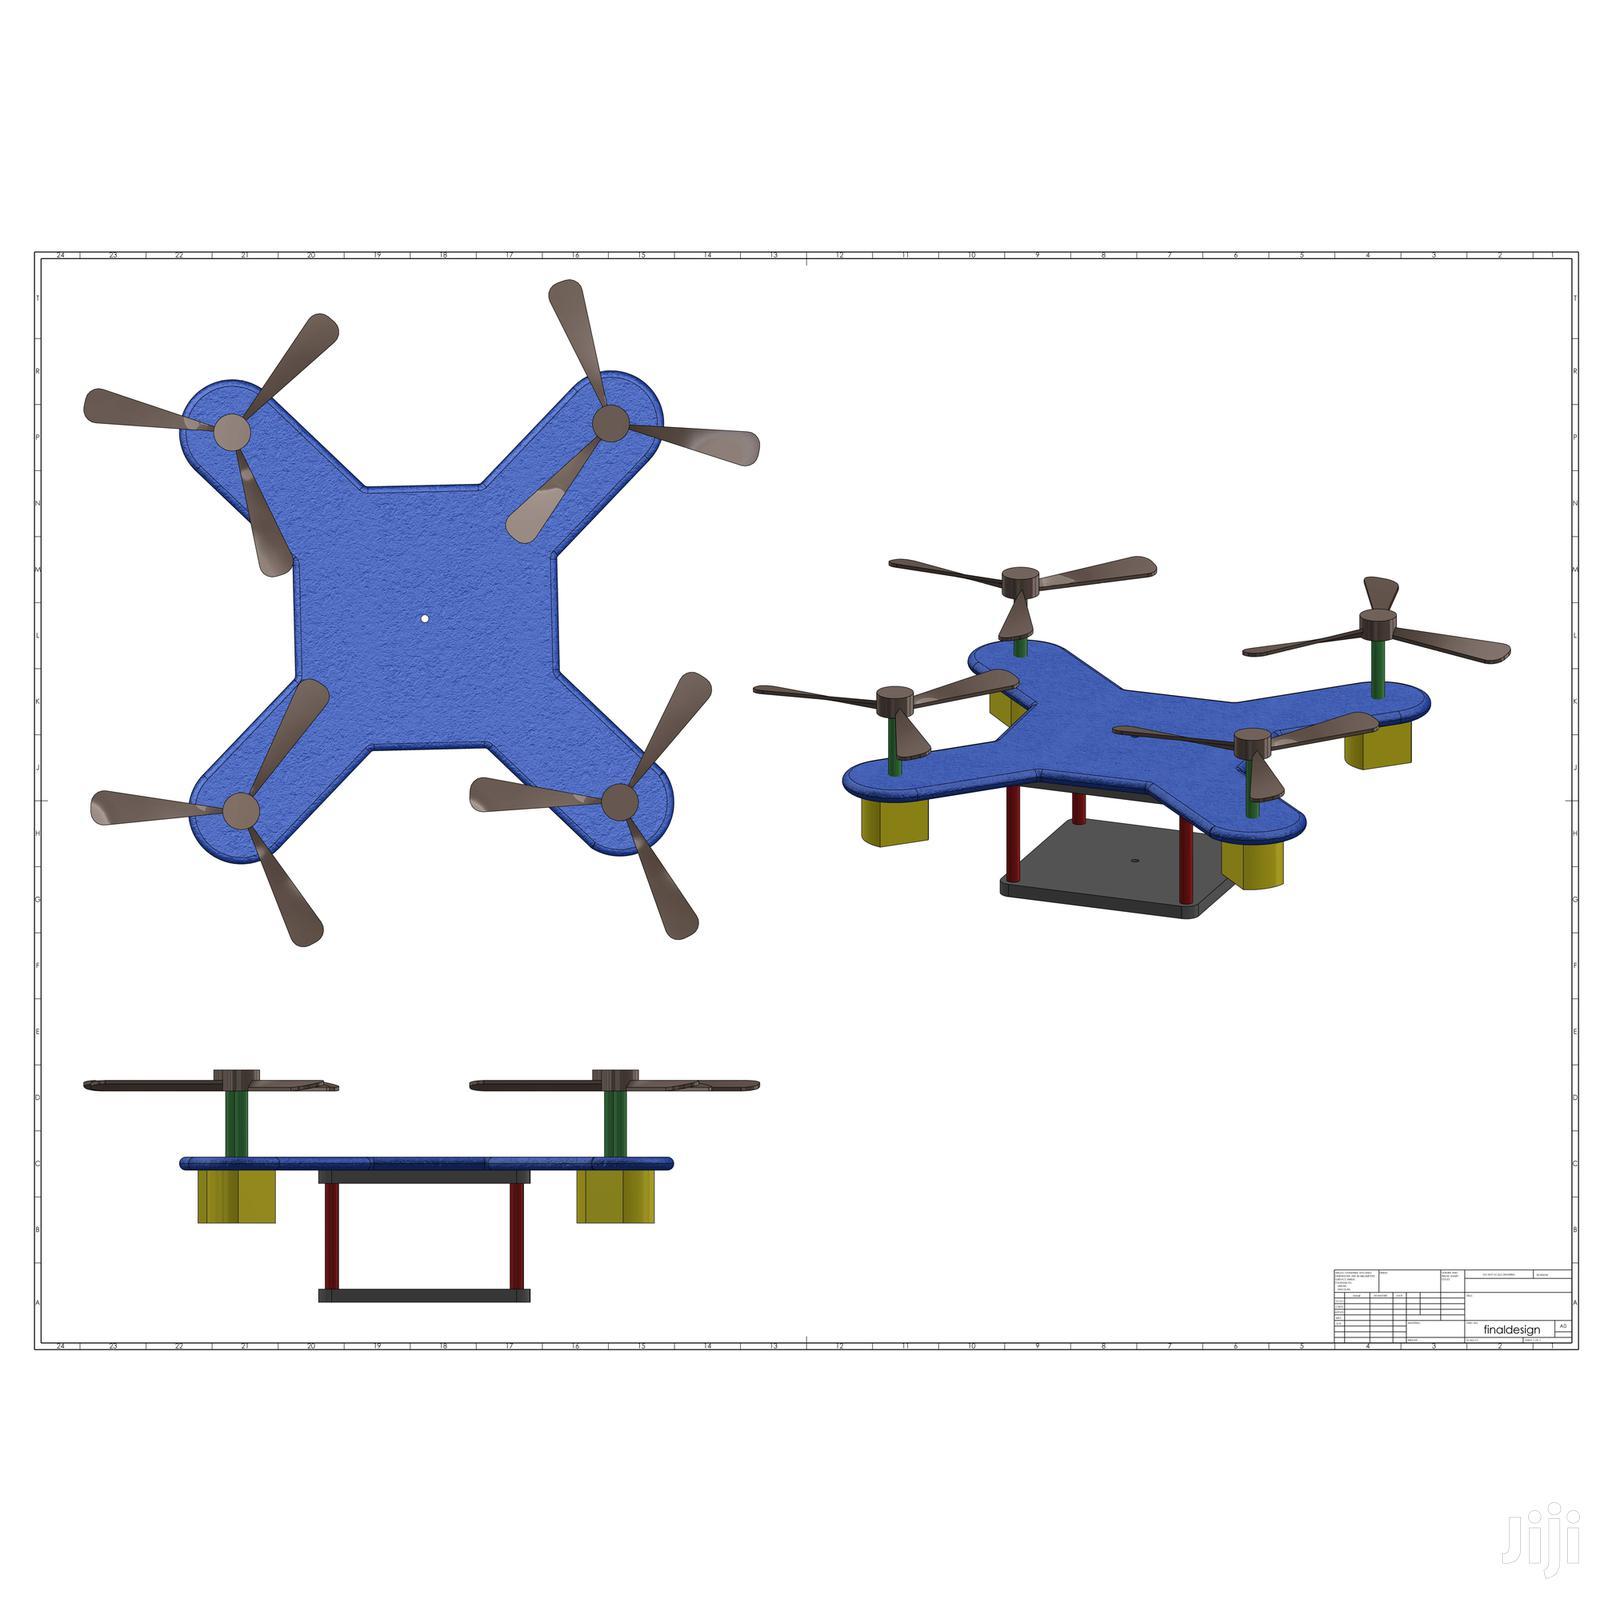 Solidworks & Autodesk Inventor CAD Modelling